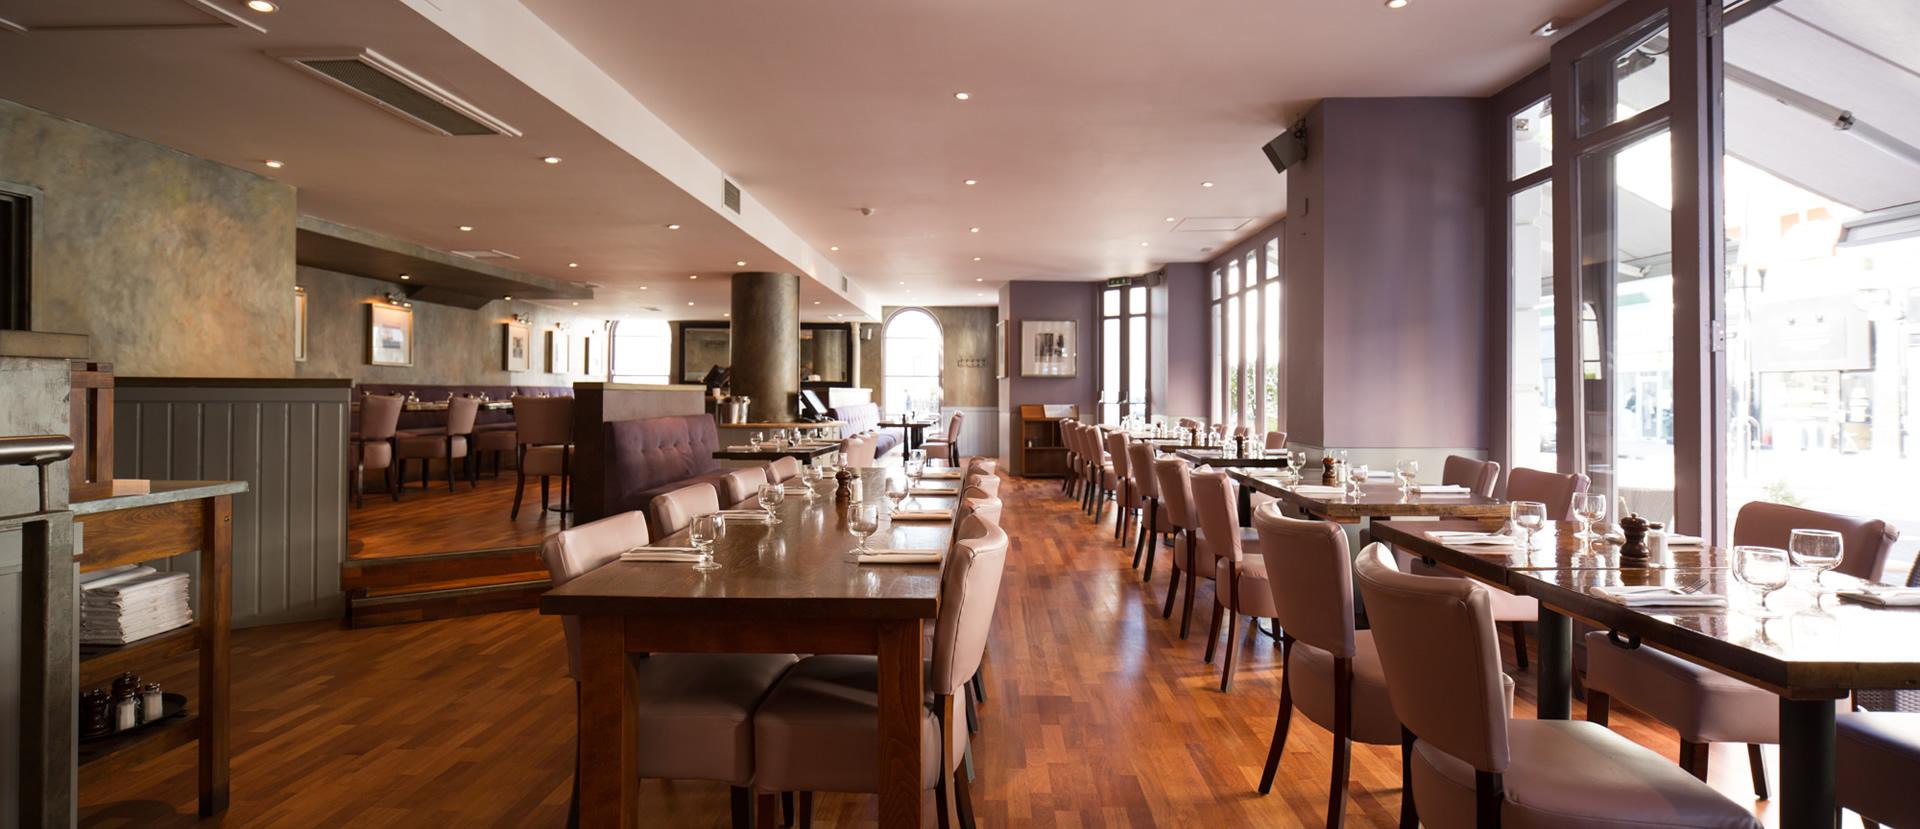 Kitchen Restaurant Kensington